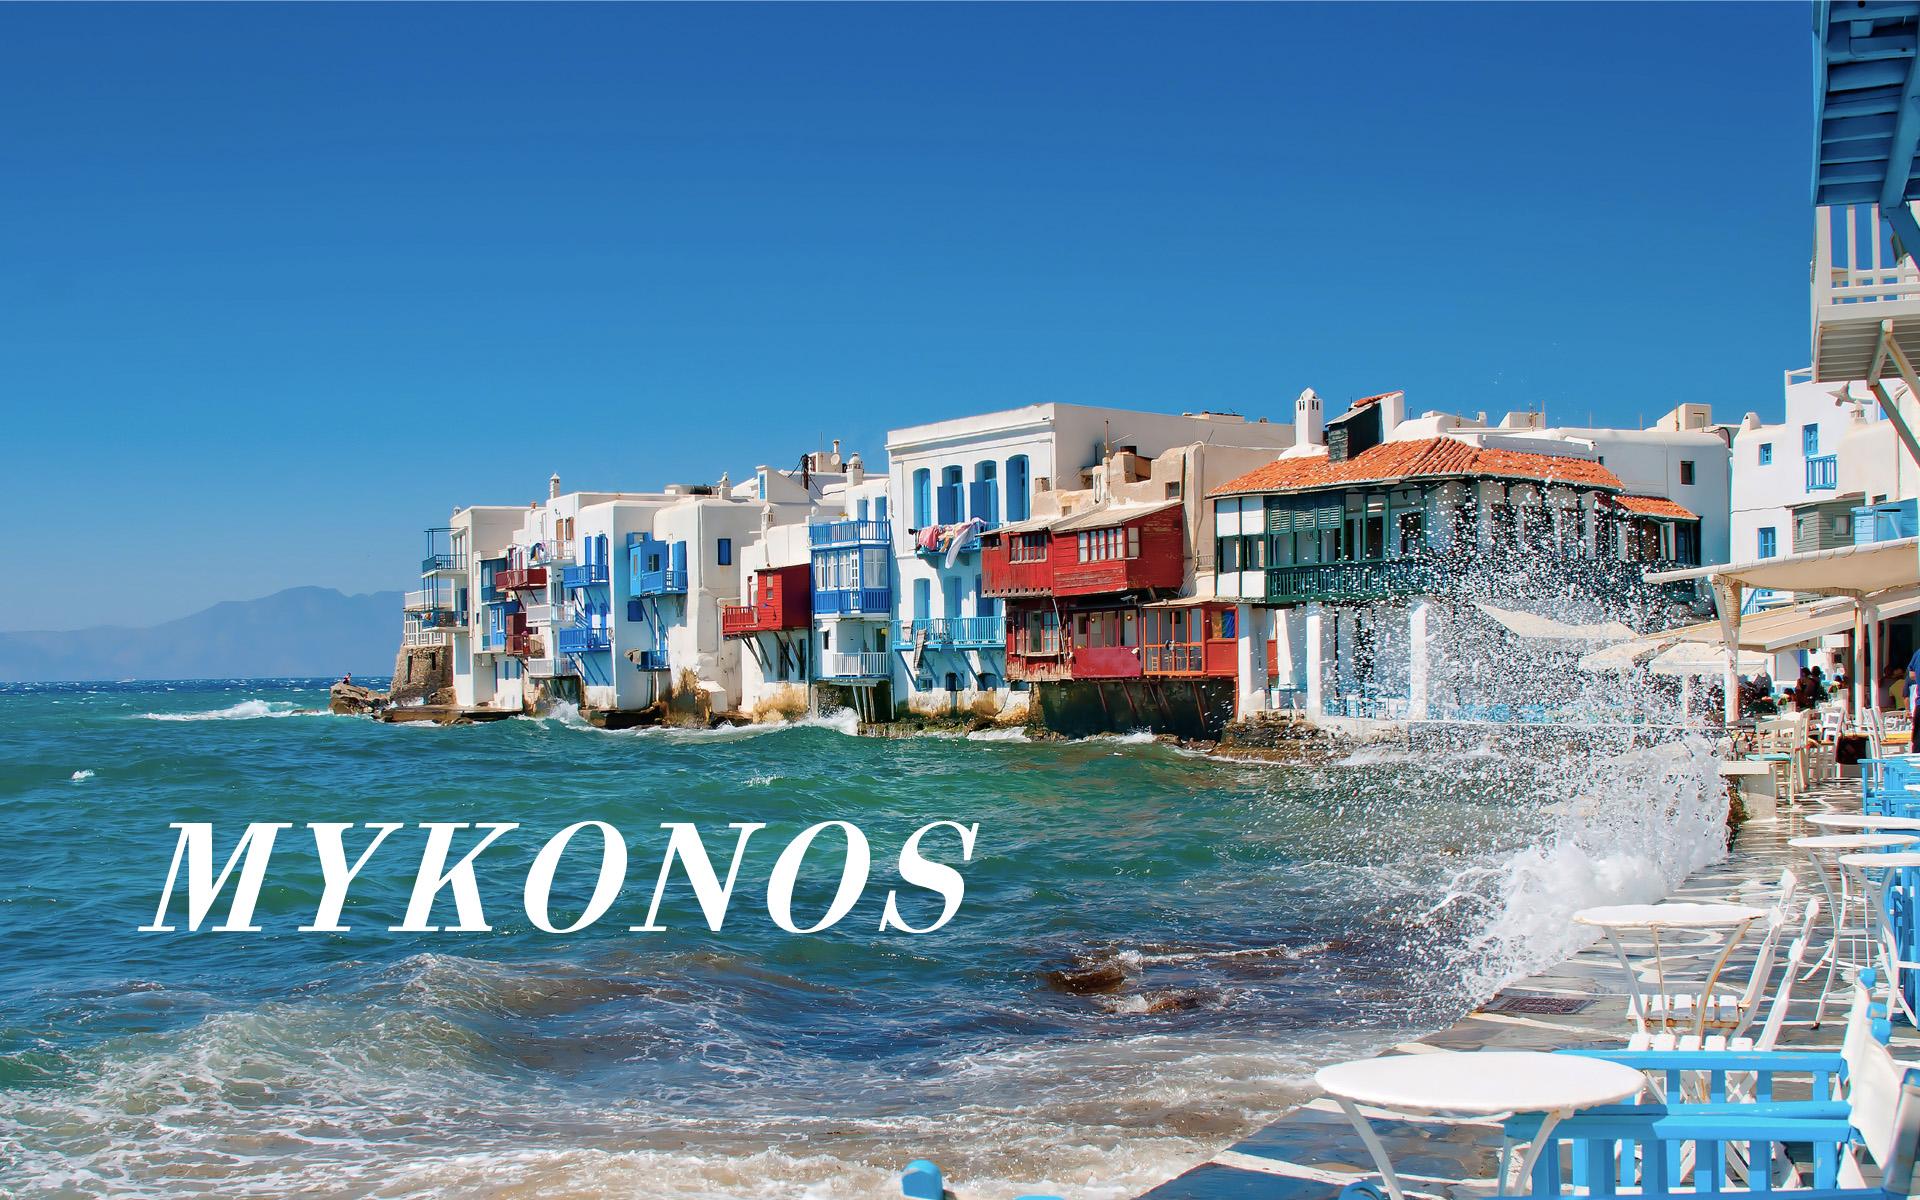 mykonos.jpg